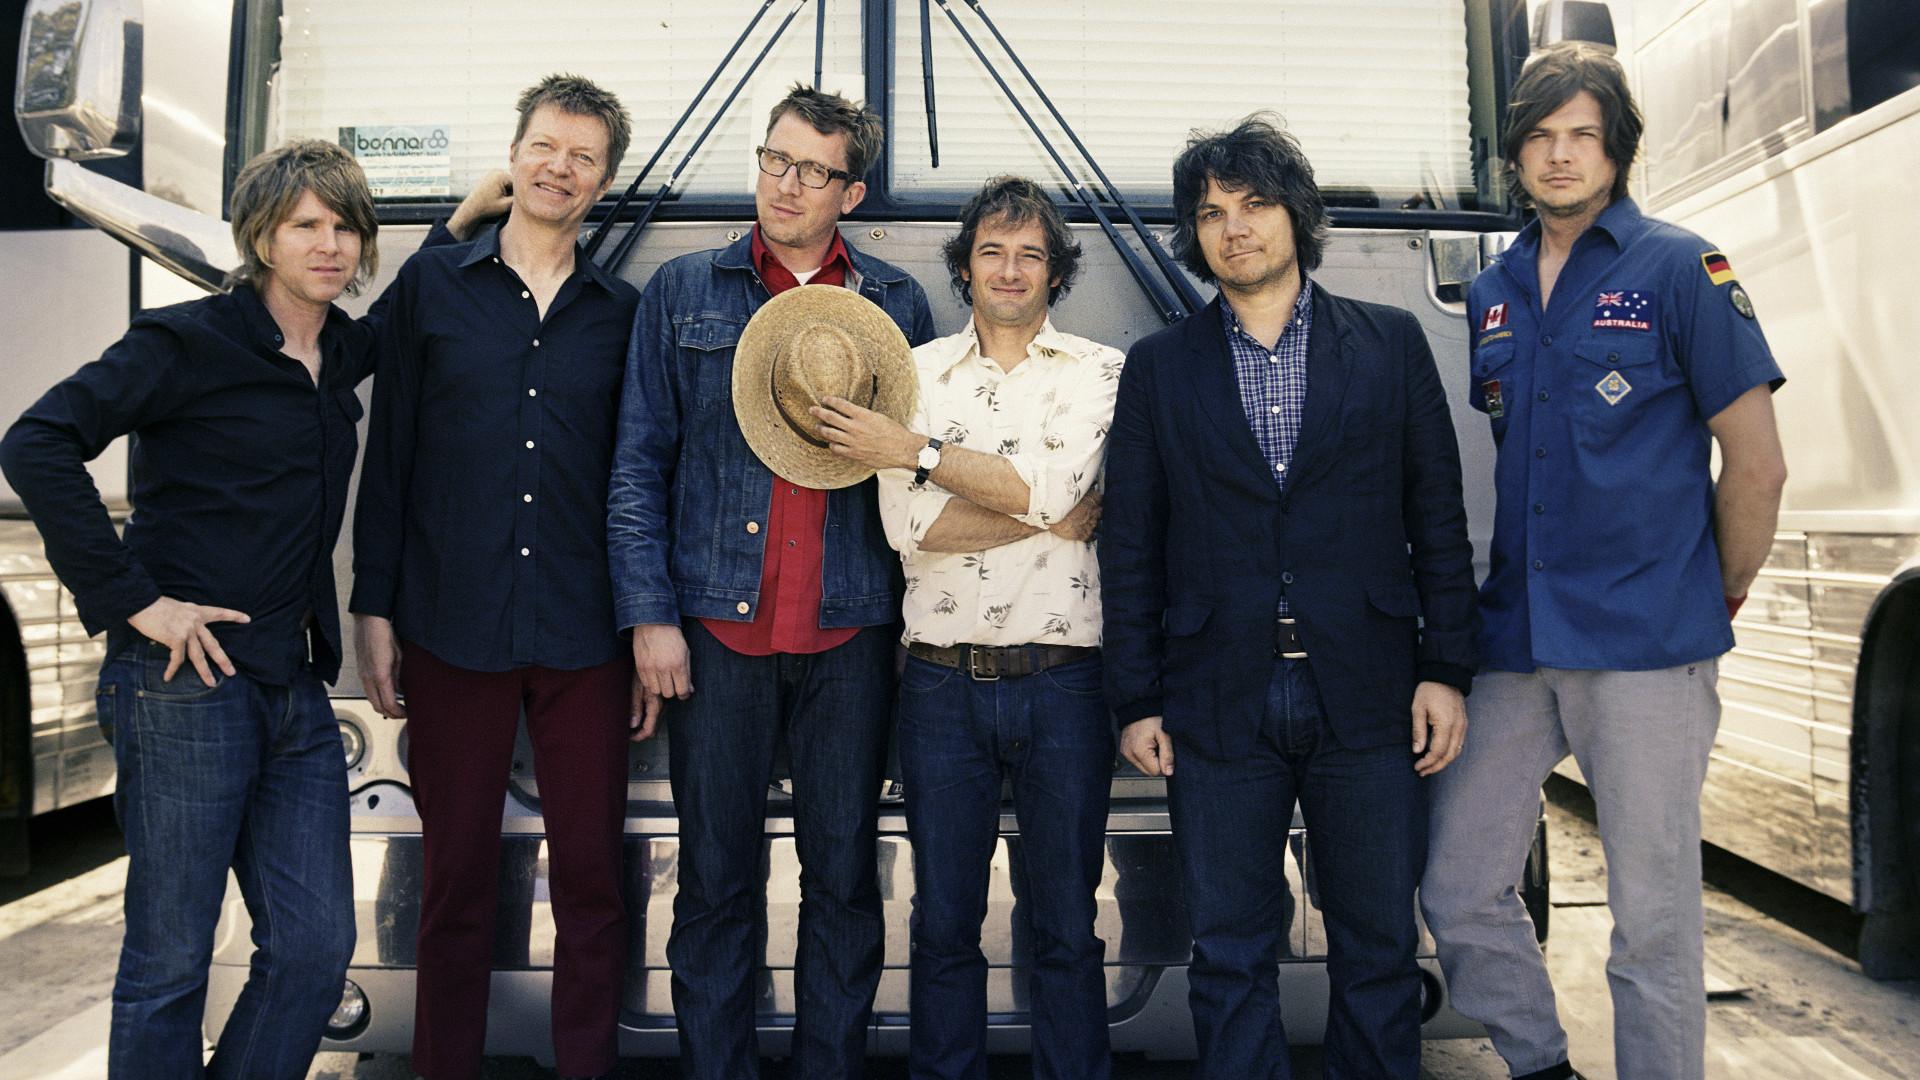 Wilco - Photo by Danny Clinch